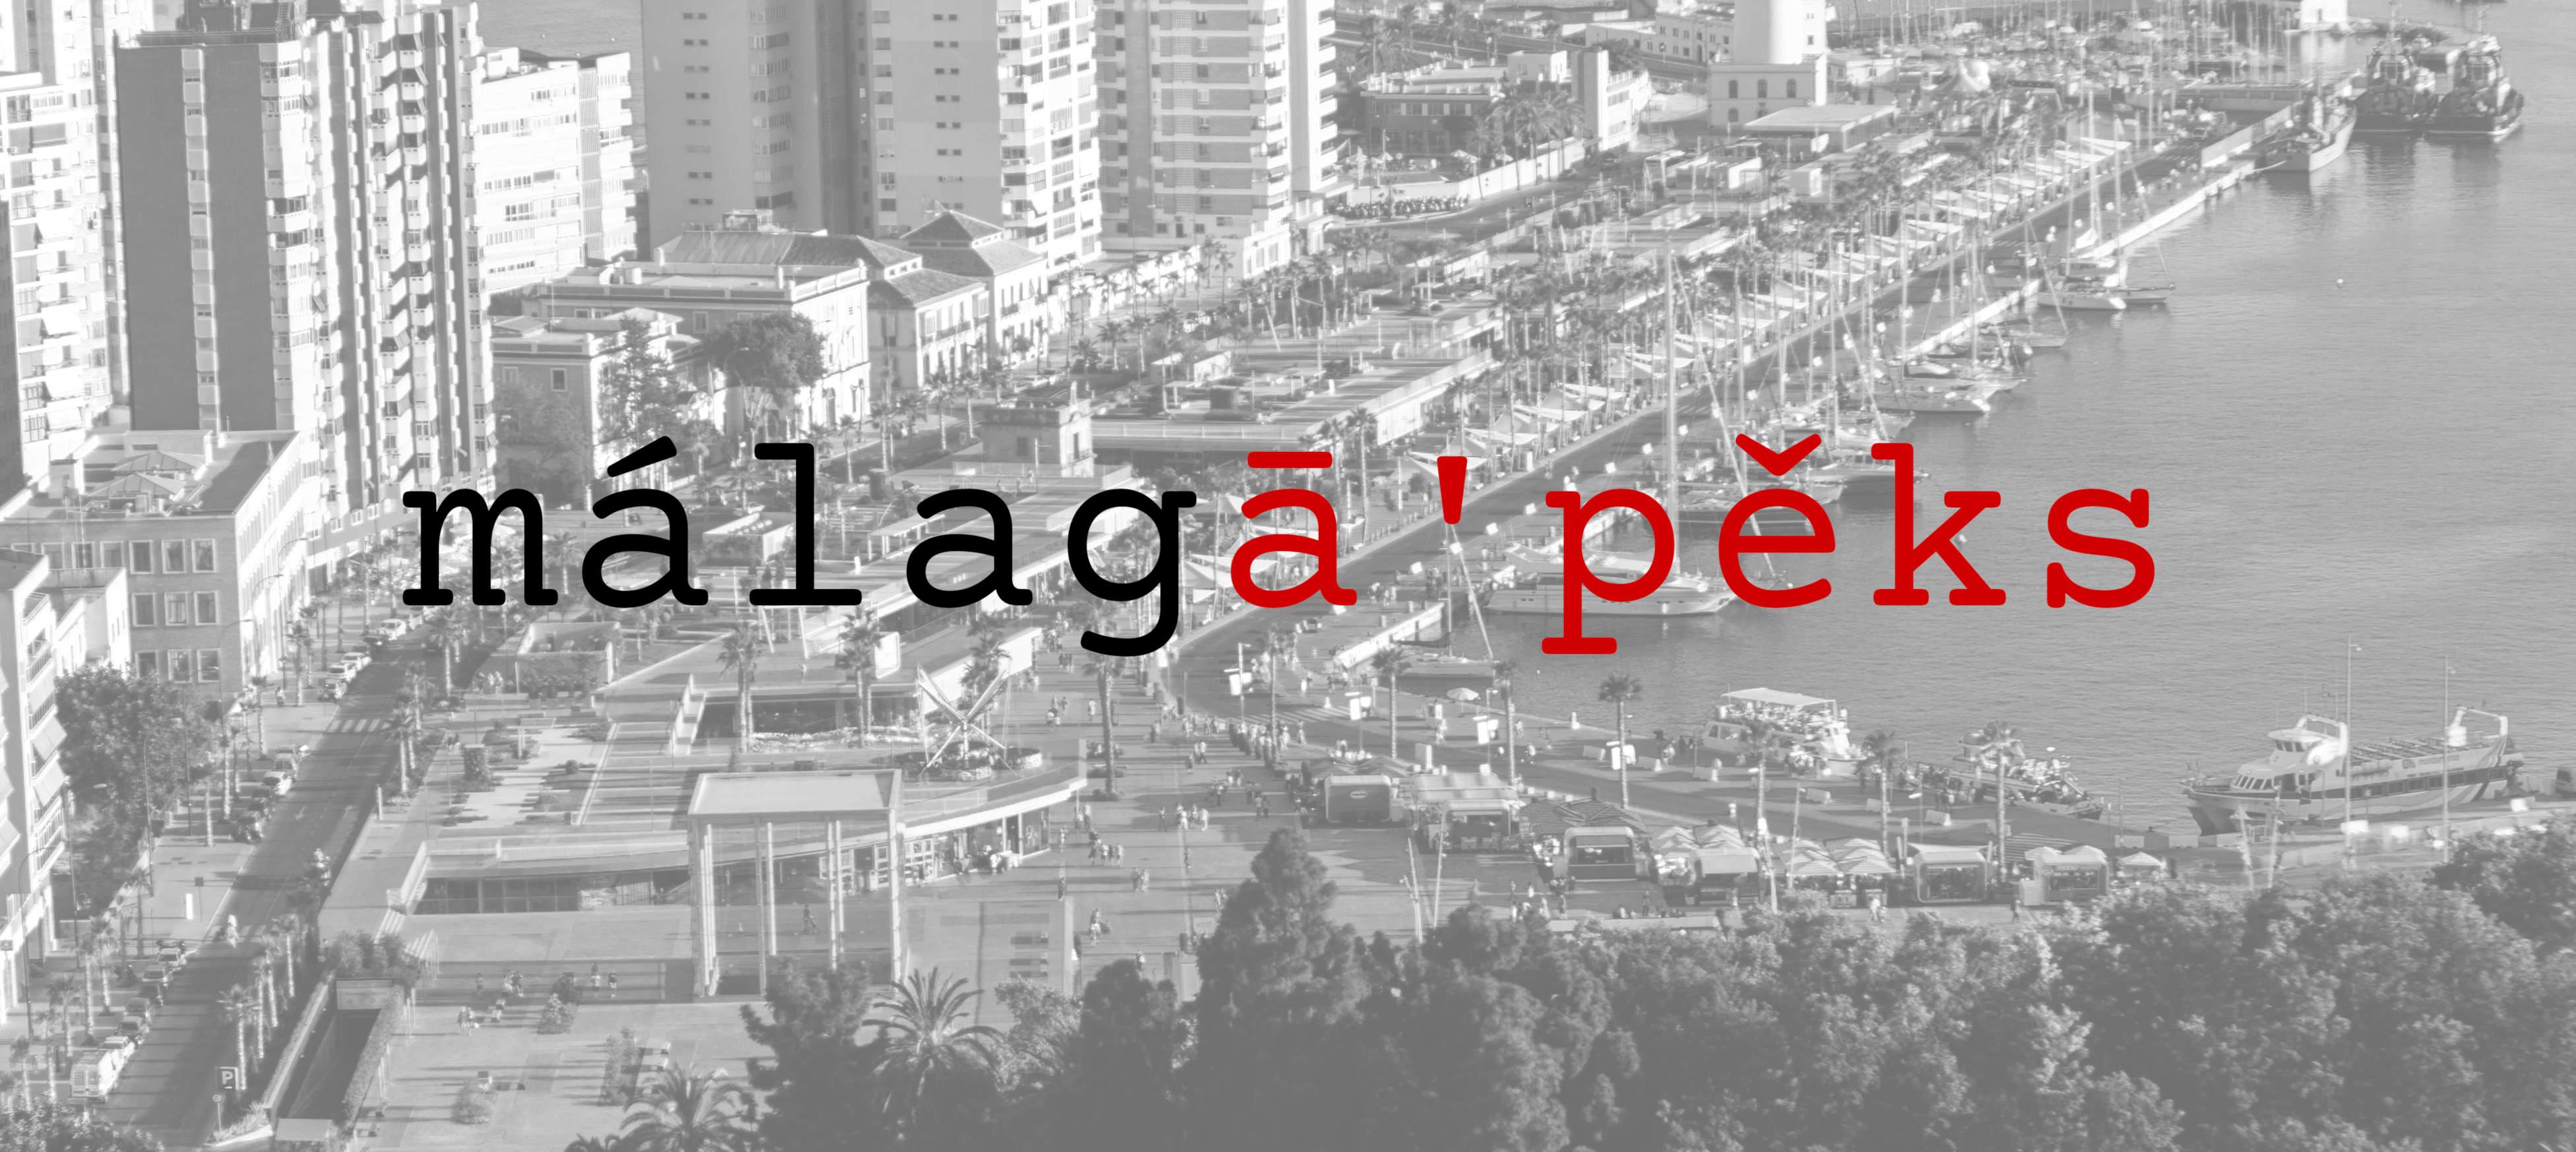 malagapex-b&w